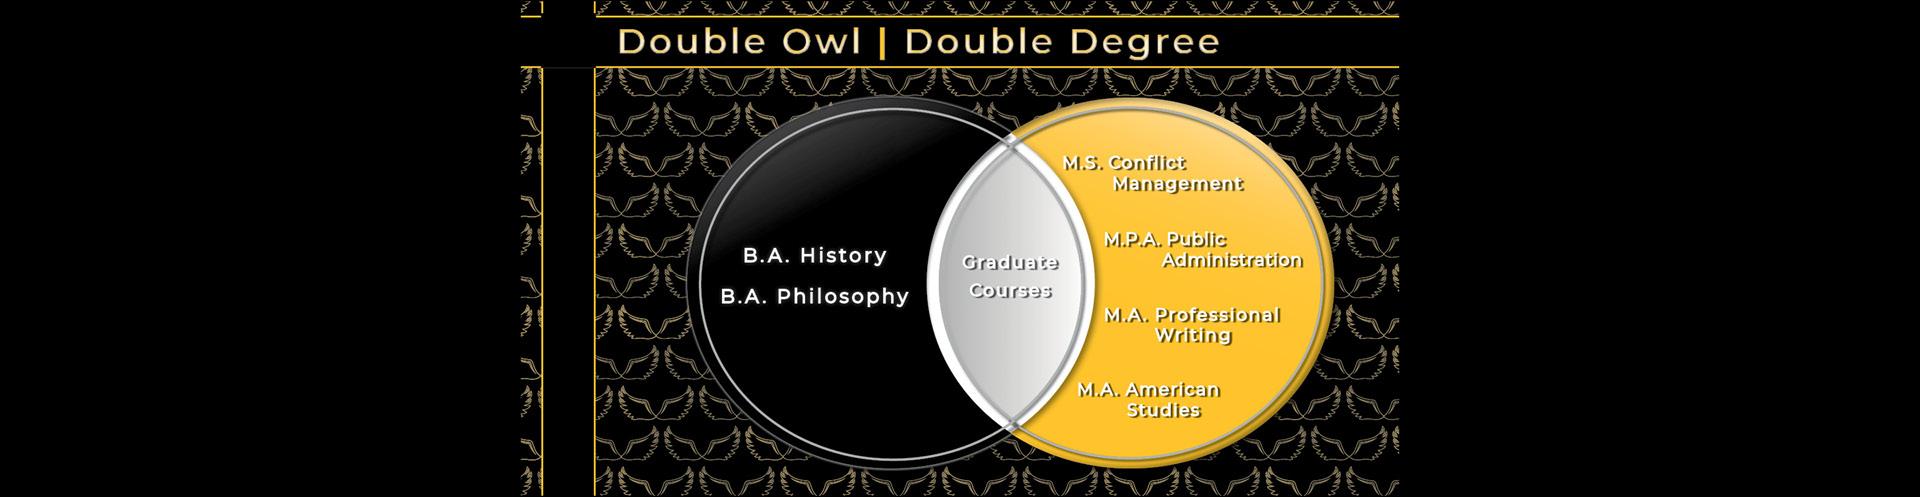 Double Owl   Double Degree